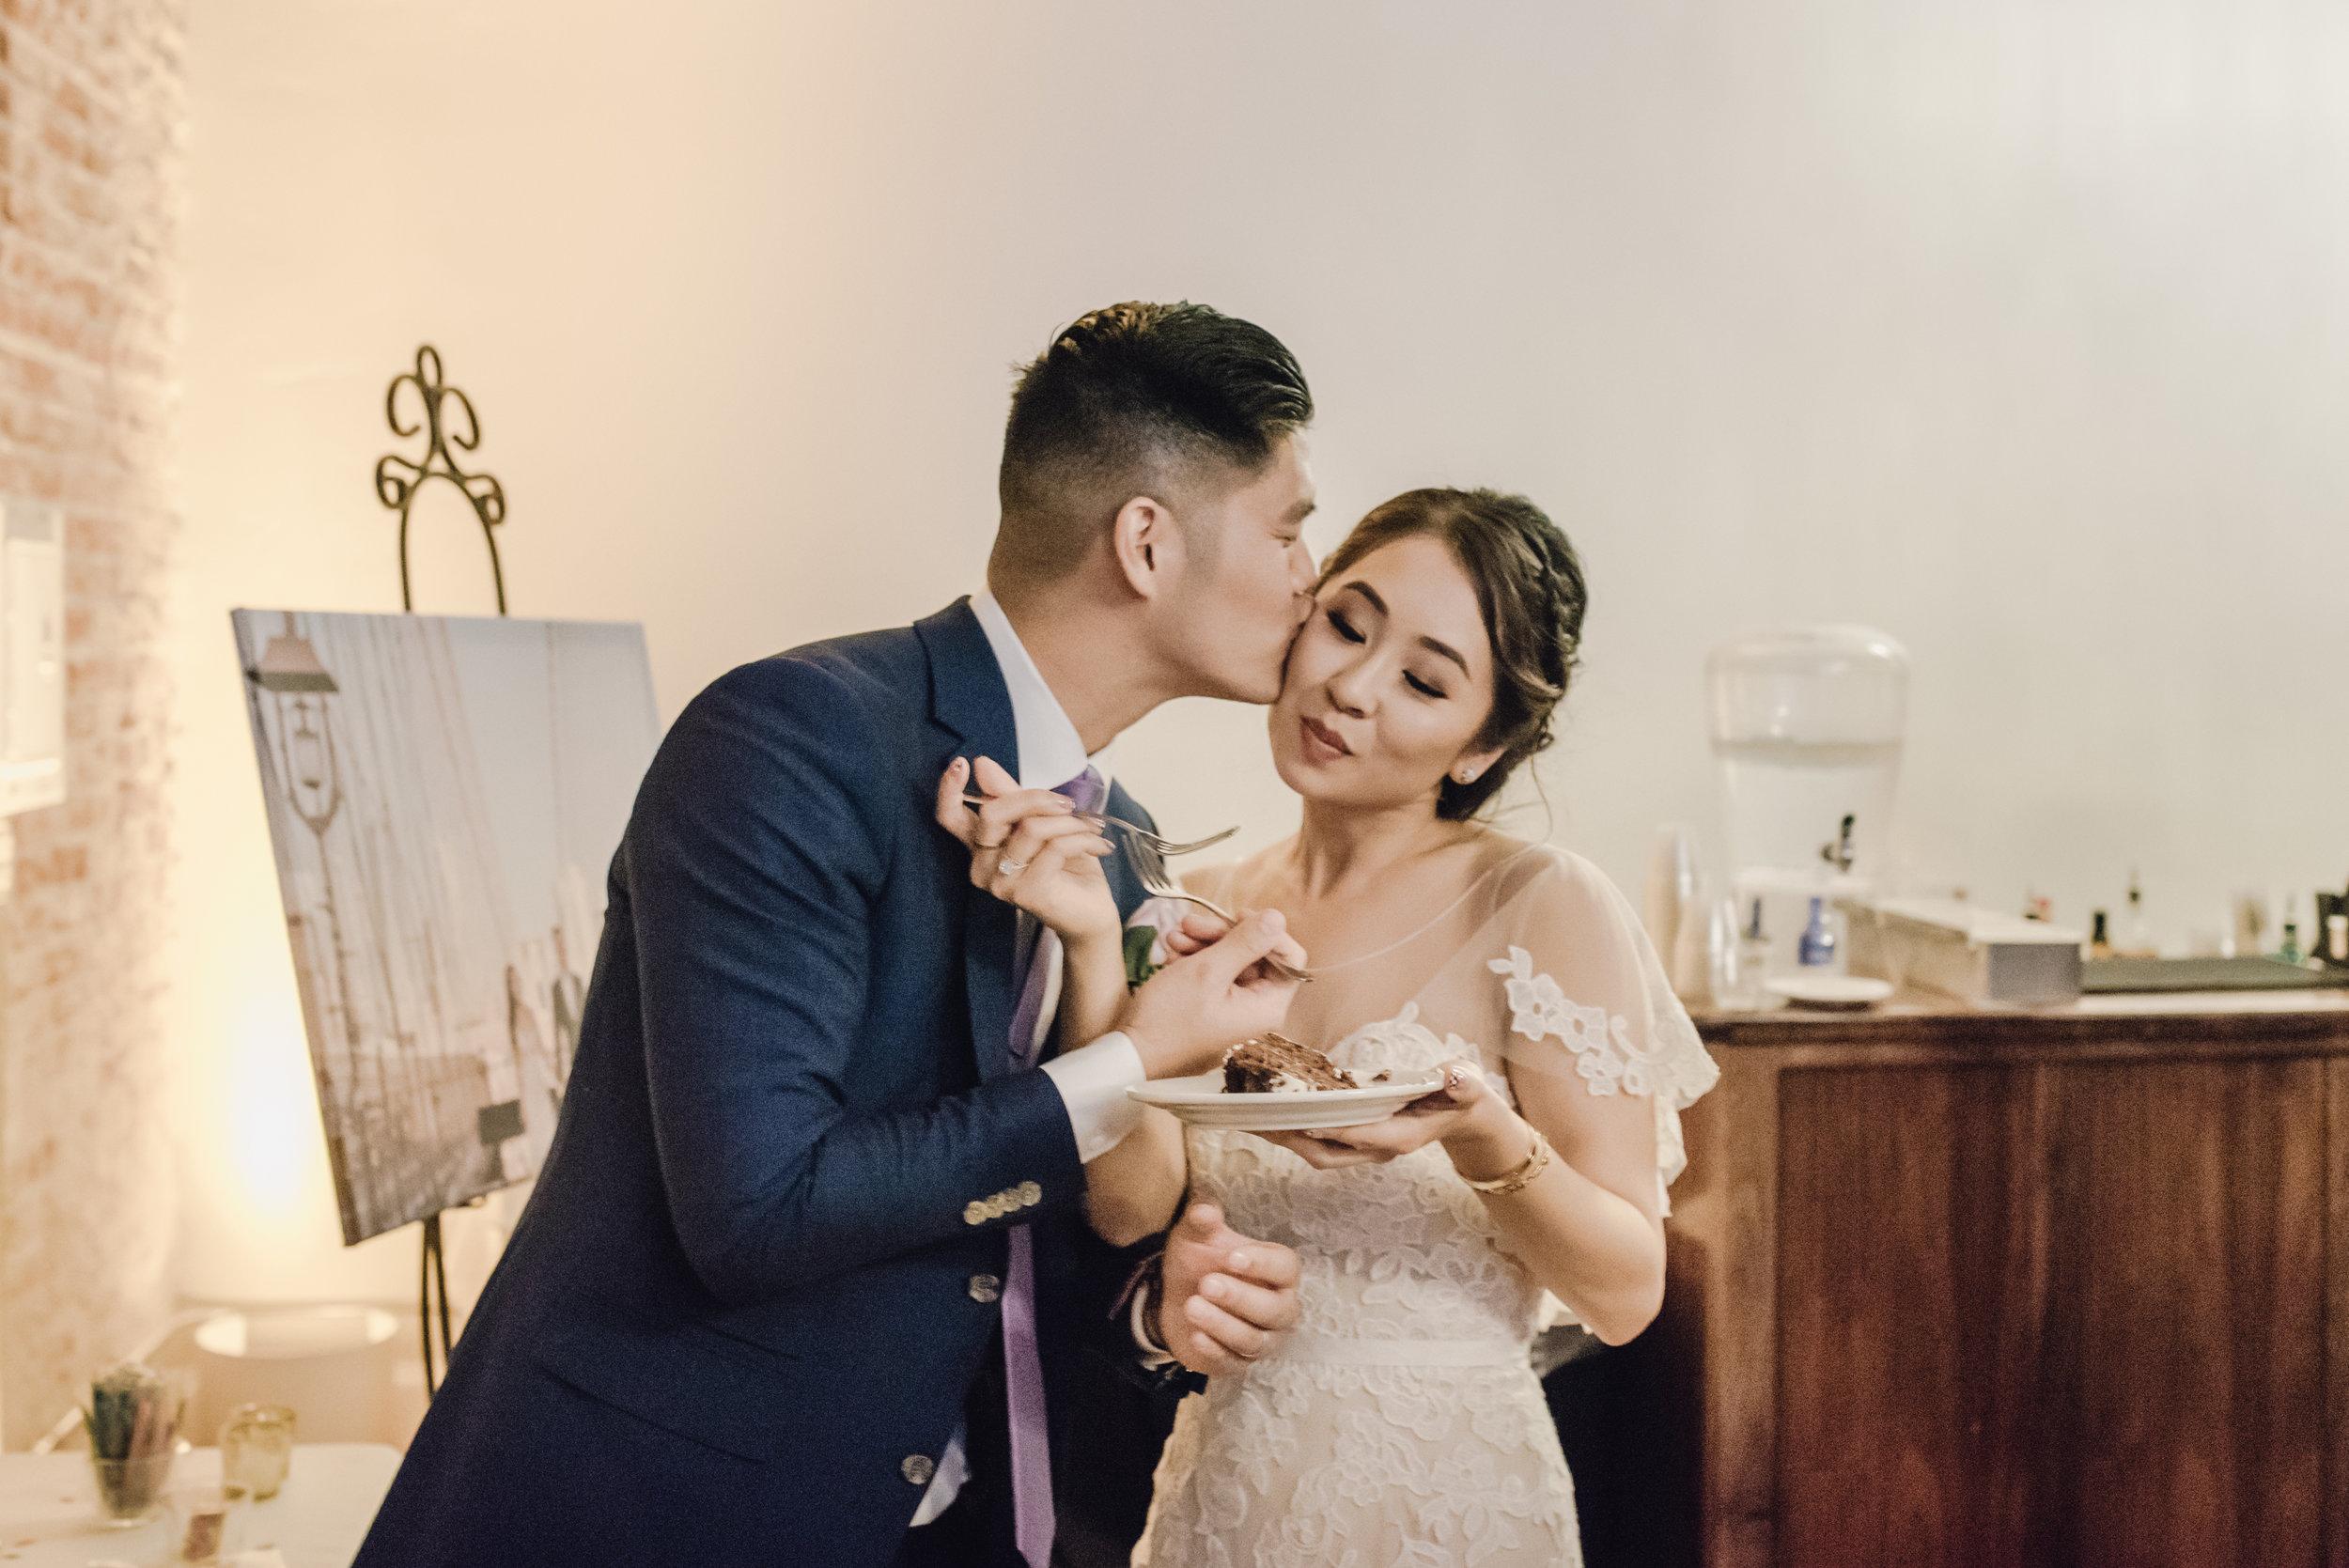 Main and Simple Photography_2017_Weddings_SanJuanCapistrano_J+B-1889.jpg